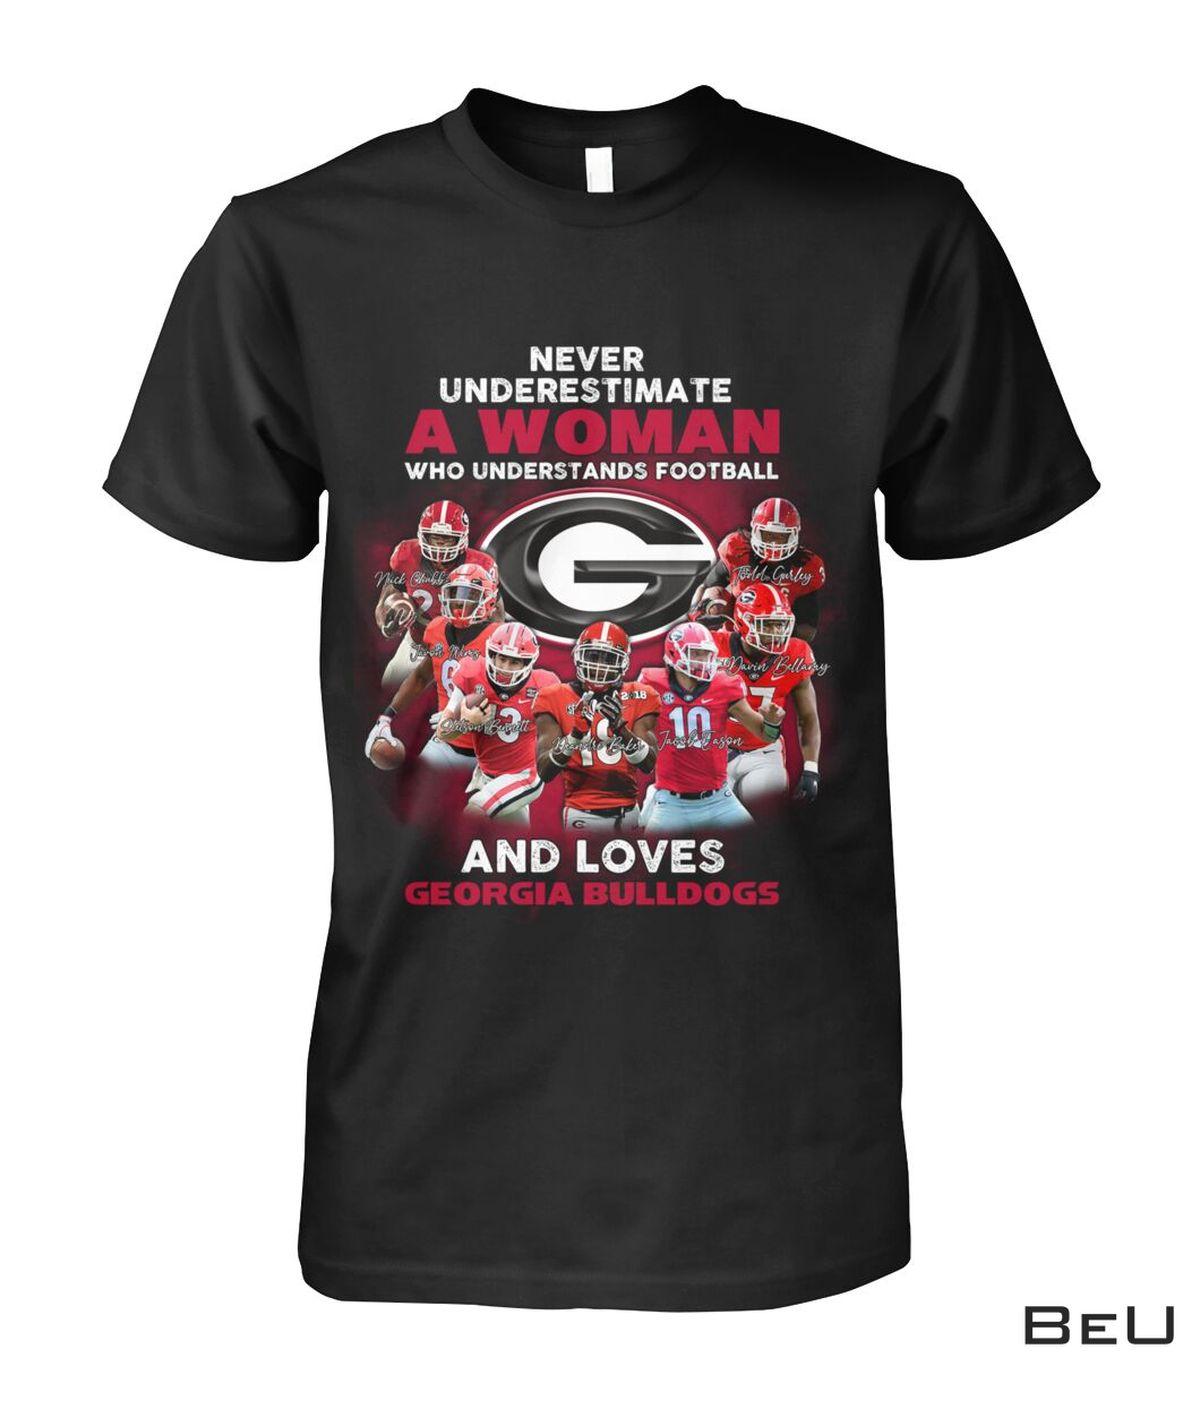 Never Underestimate A Woman Who Loves Georgia Bulldogs Shirt, Hoodie, Sweatshirt